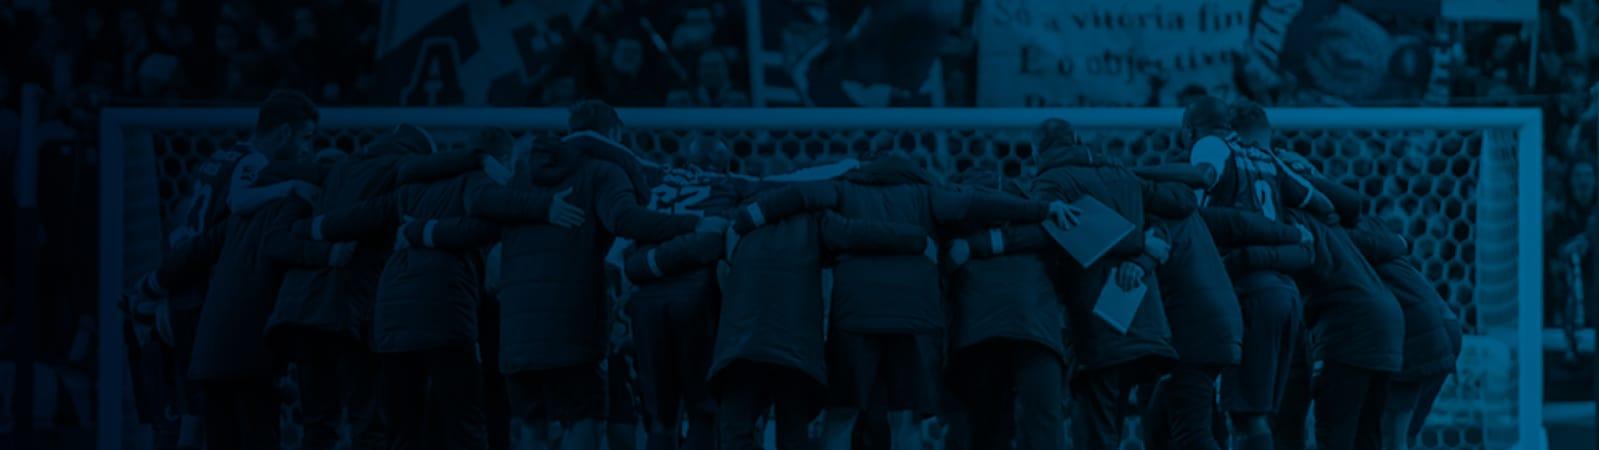 Fc Porto Futebol Resultados Fc Porto